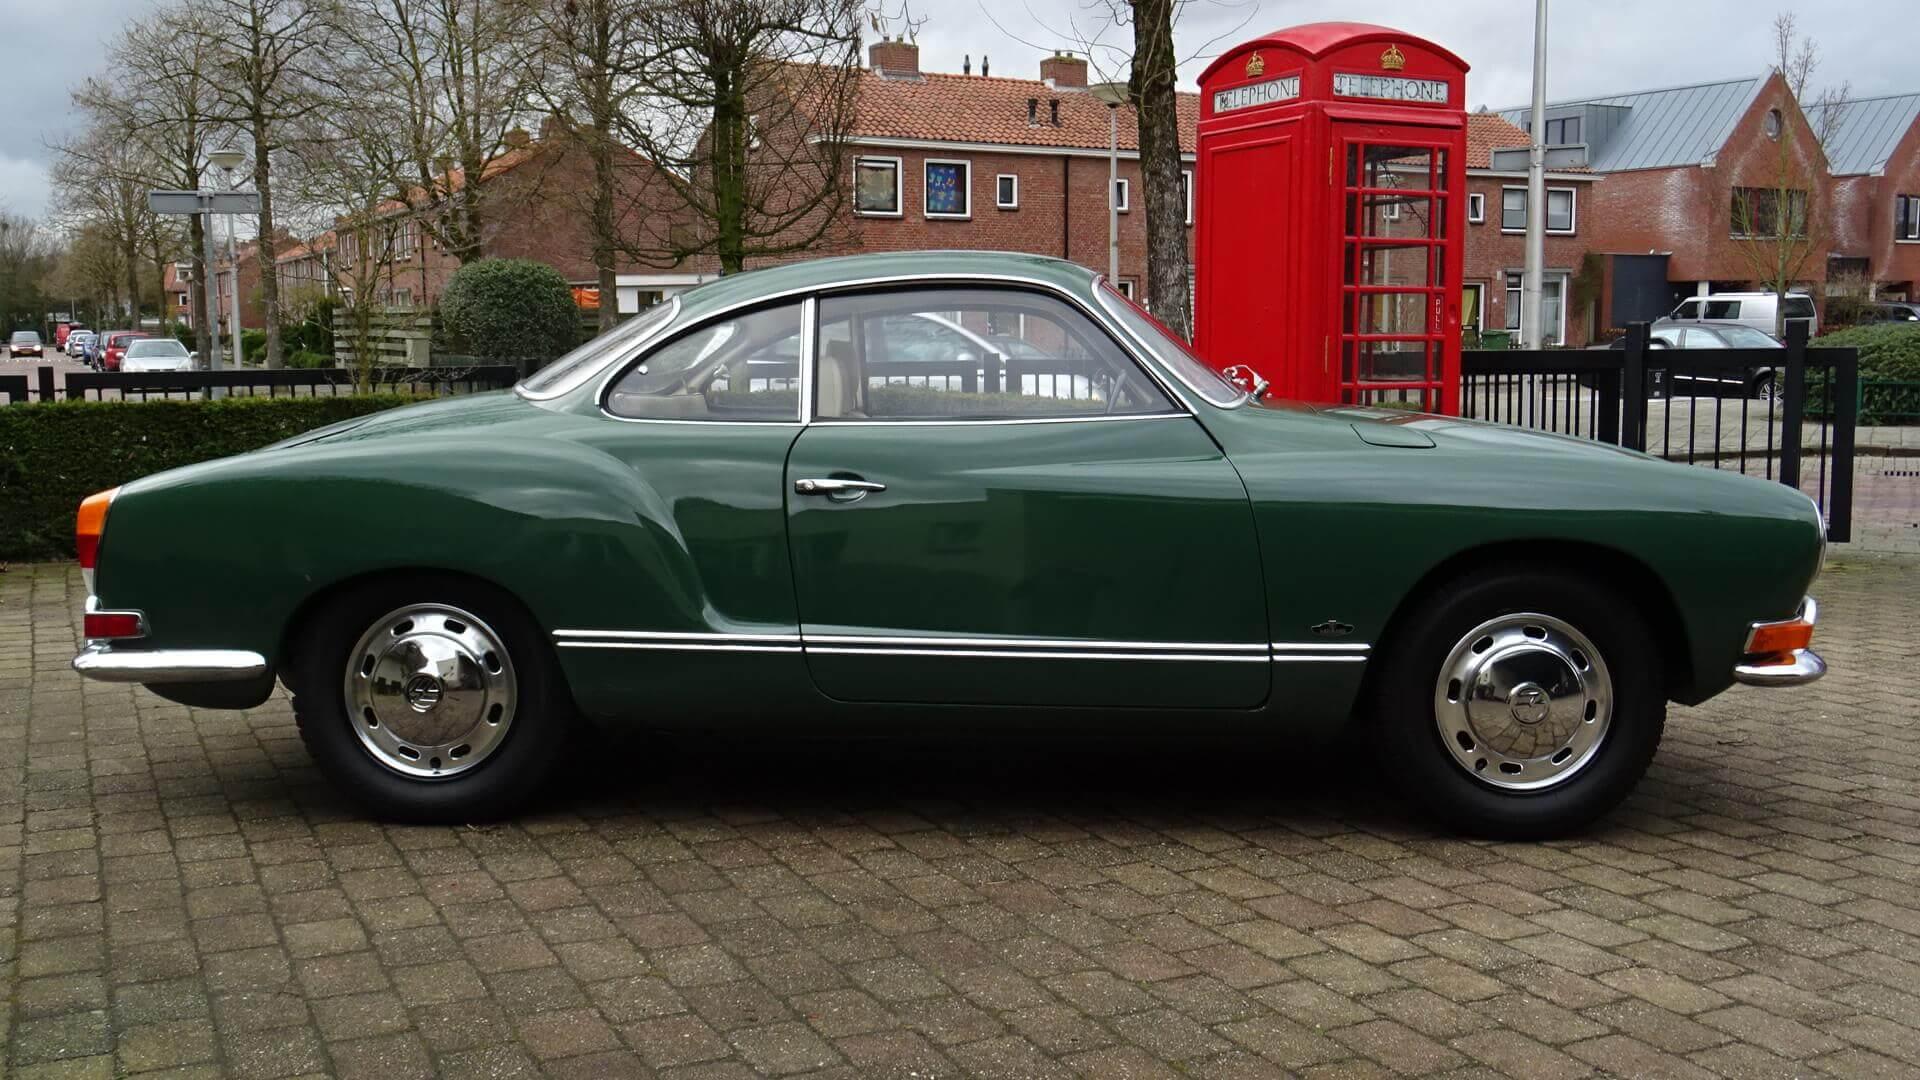 Vw Karmann Ghia Union Jack Vintage Cars 1950 Volkswagen Sold